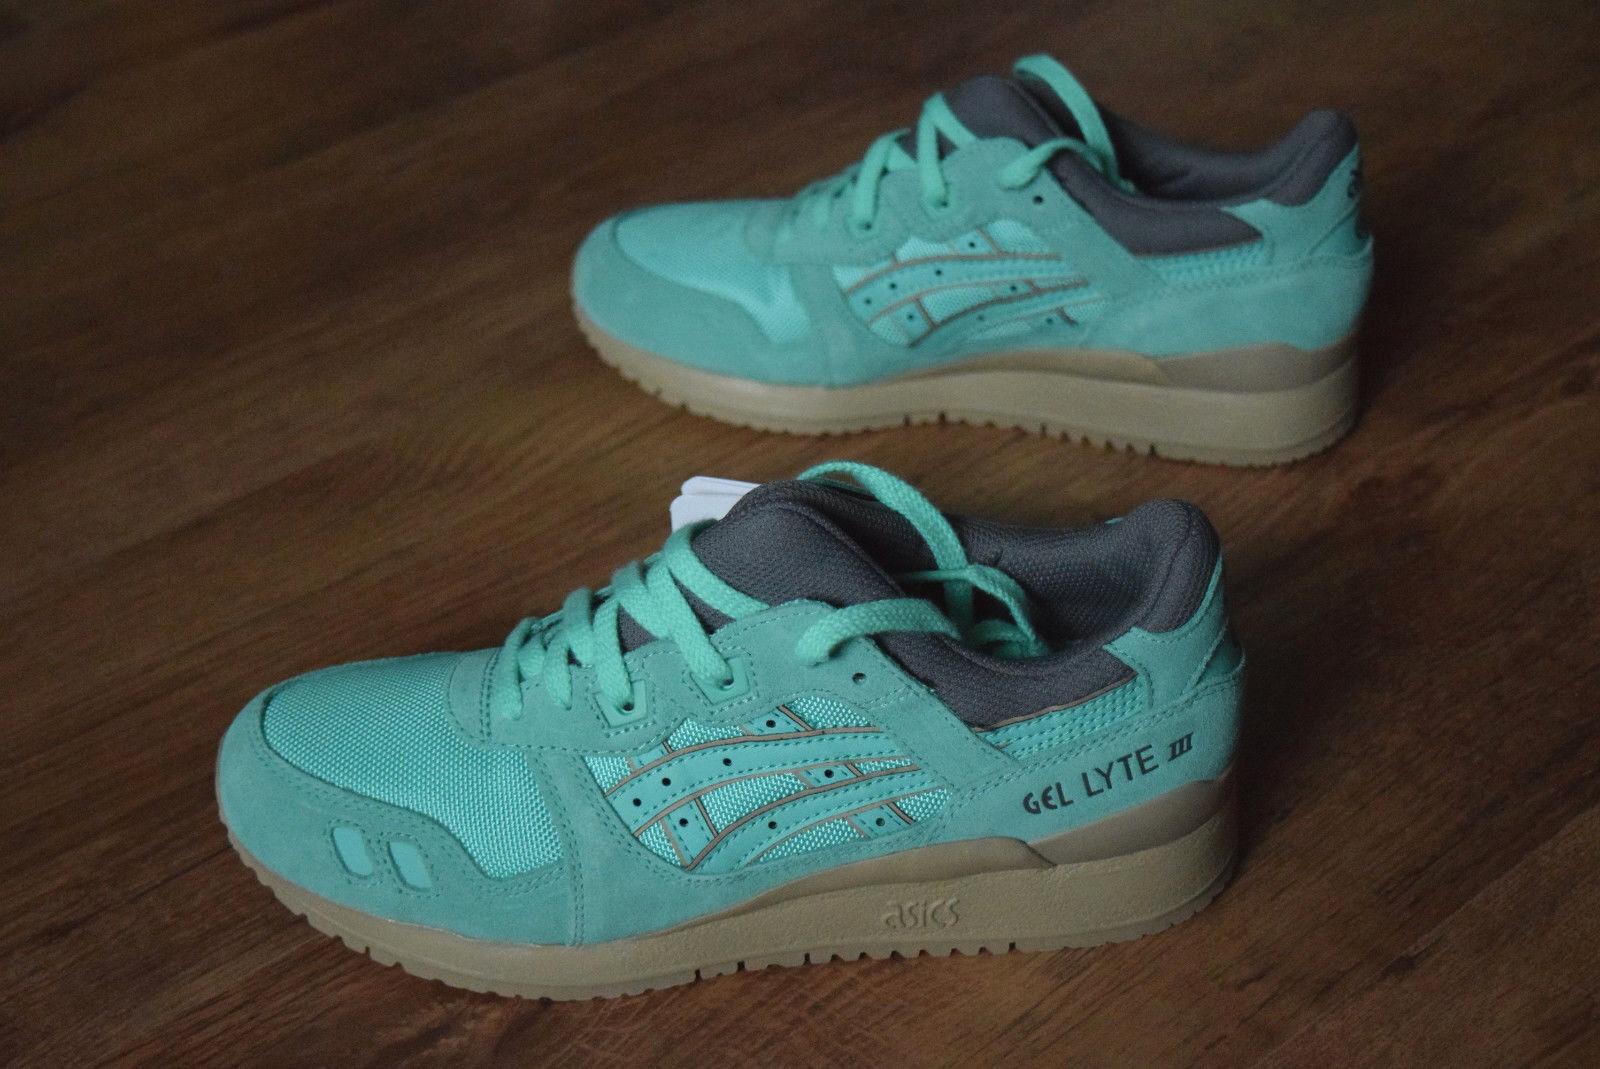 Zapatos promocionales para hombres y mujeres ASICS GEL LYTE III gr-39 h6w7n 4747 SAGA GT II Footpatrol IV V